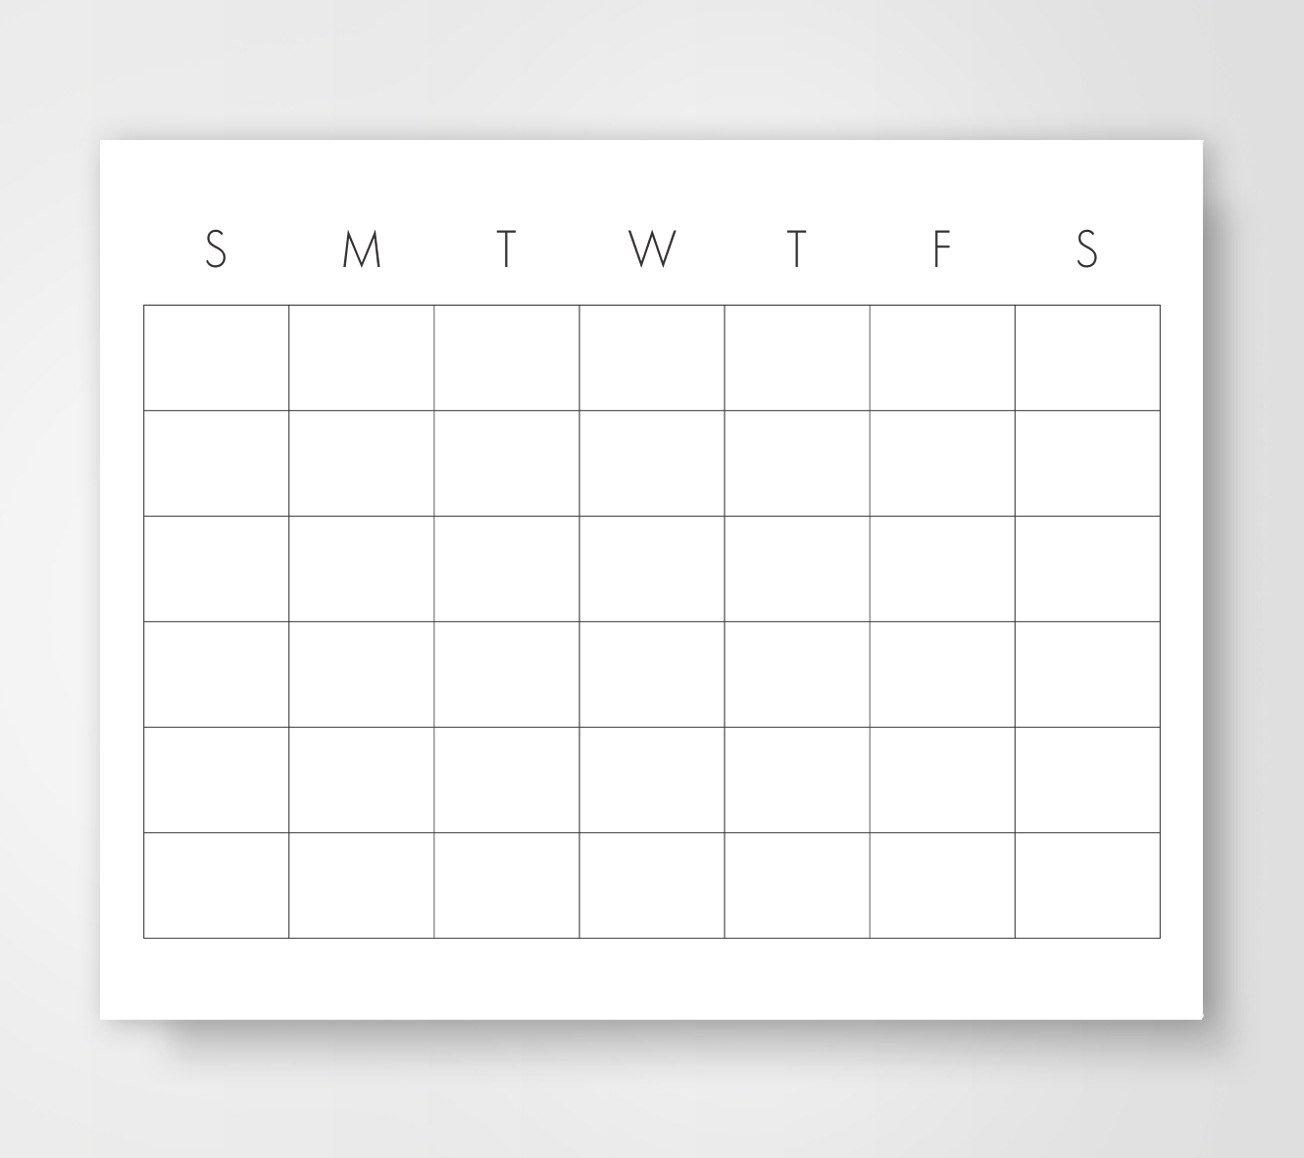 Printable Calendar 8 X 11 :-Free Calendar Template 8X11 Sie Free April Calander